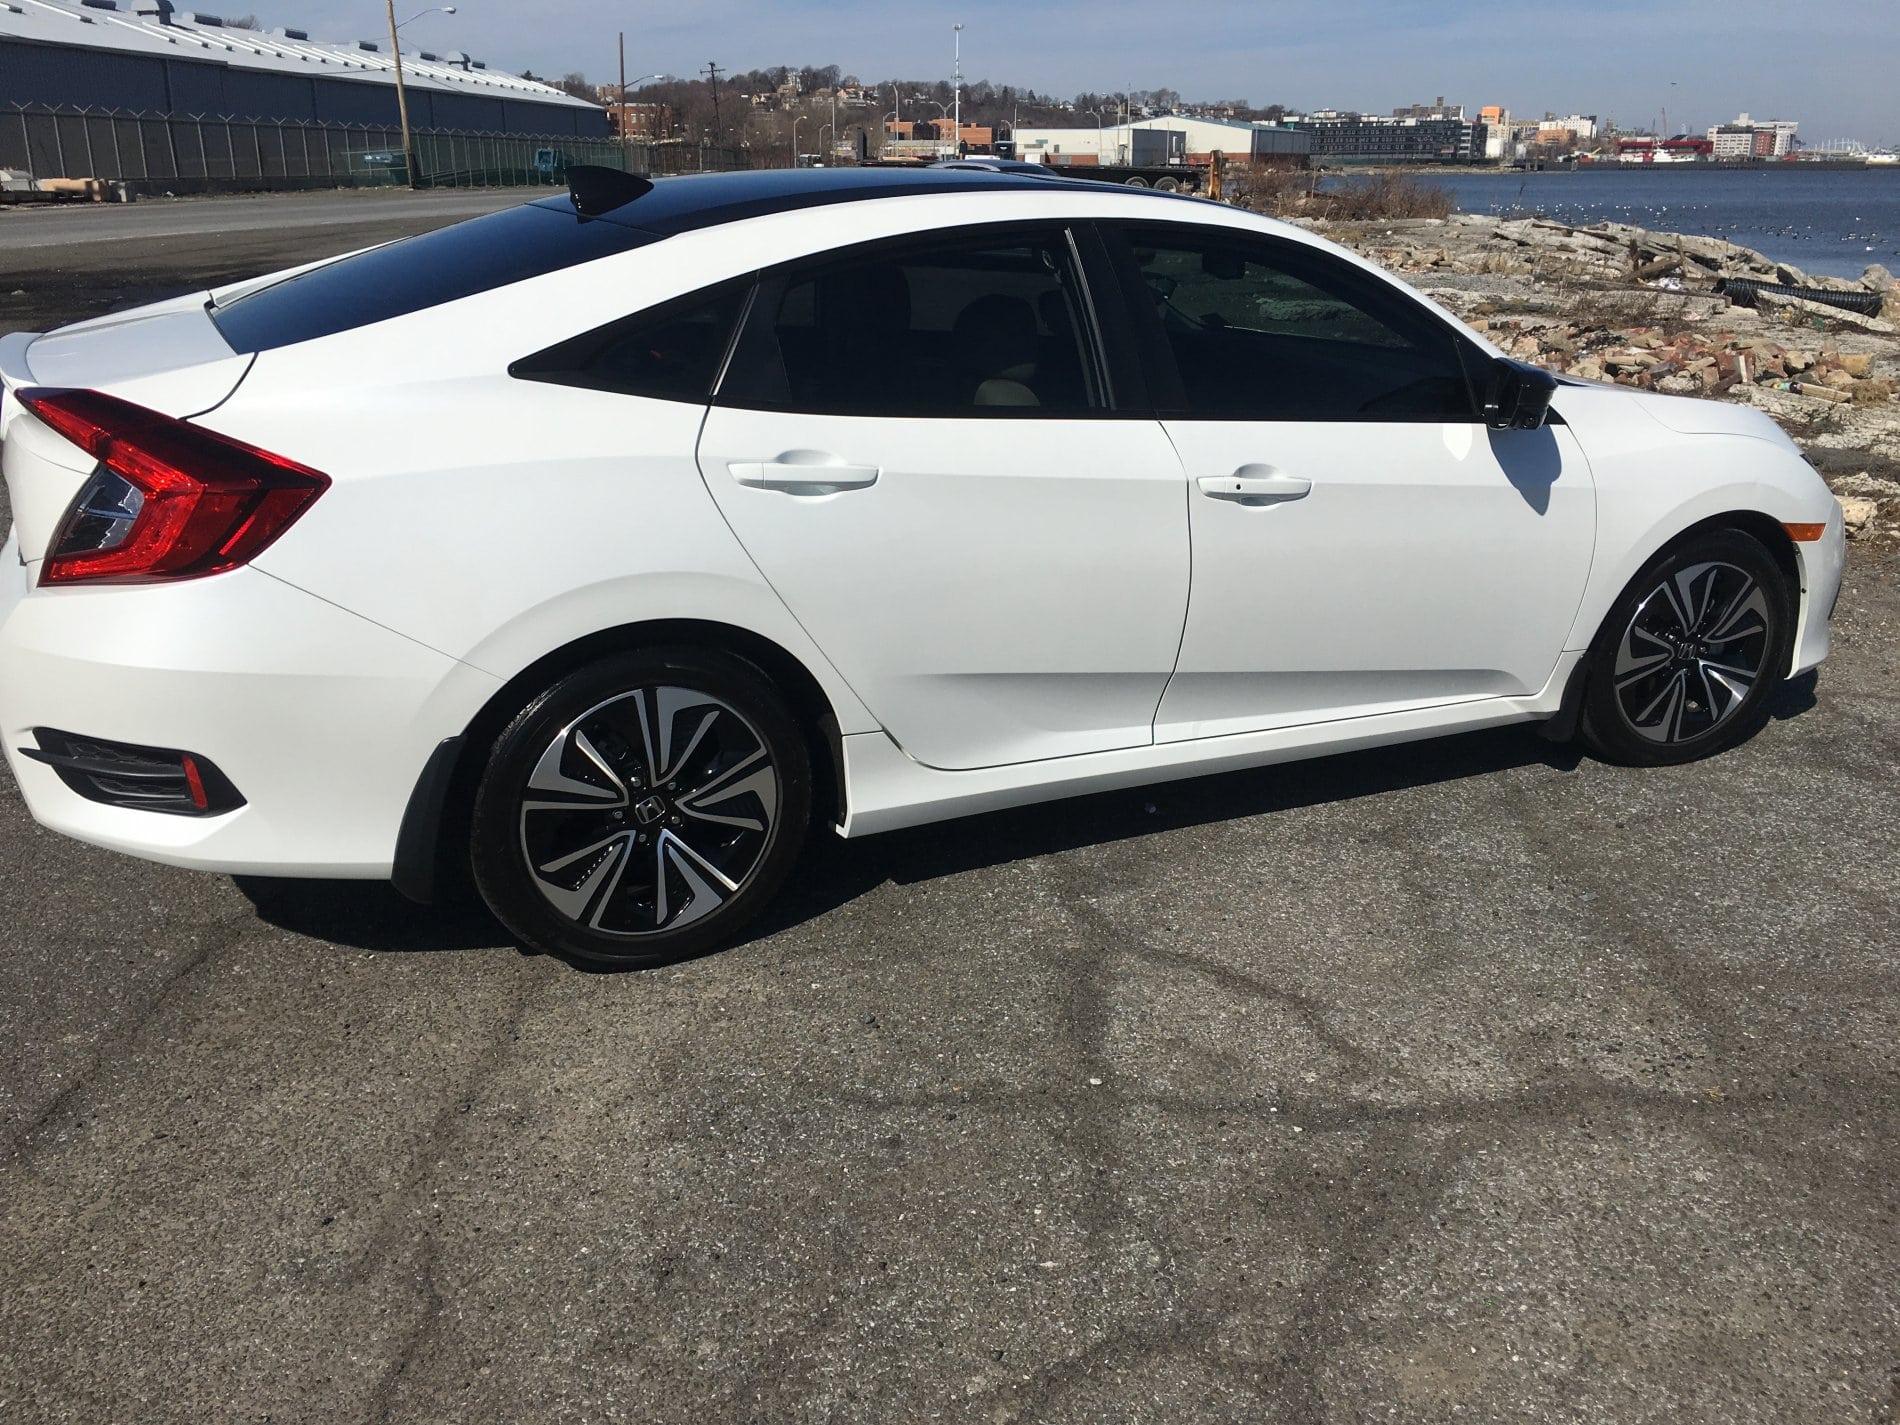 Honda Civic 10 Backgrounds